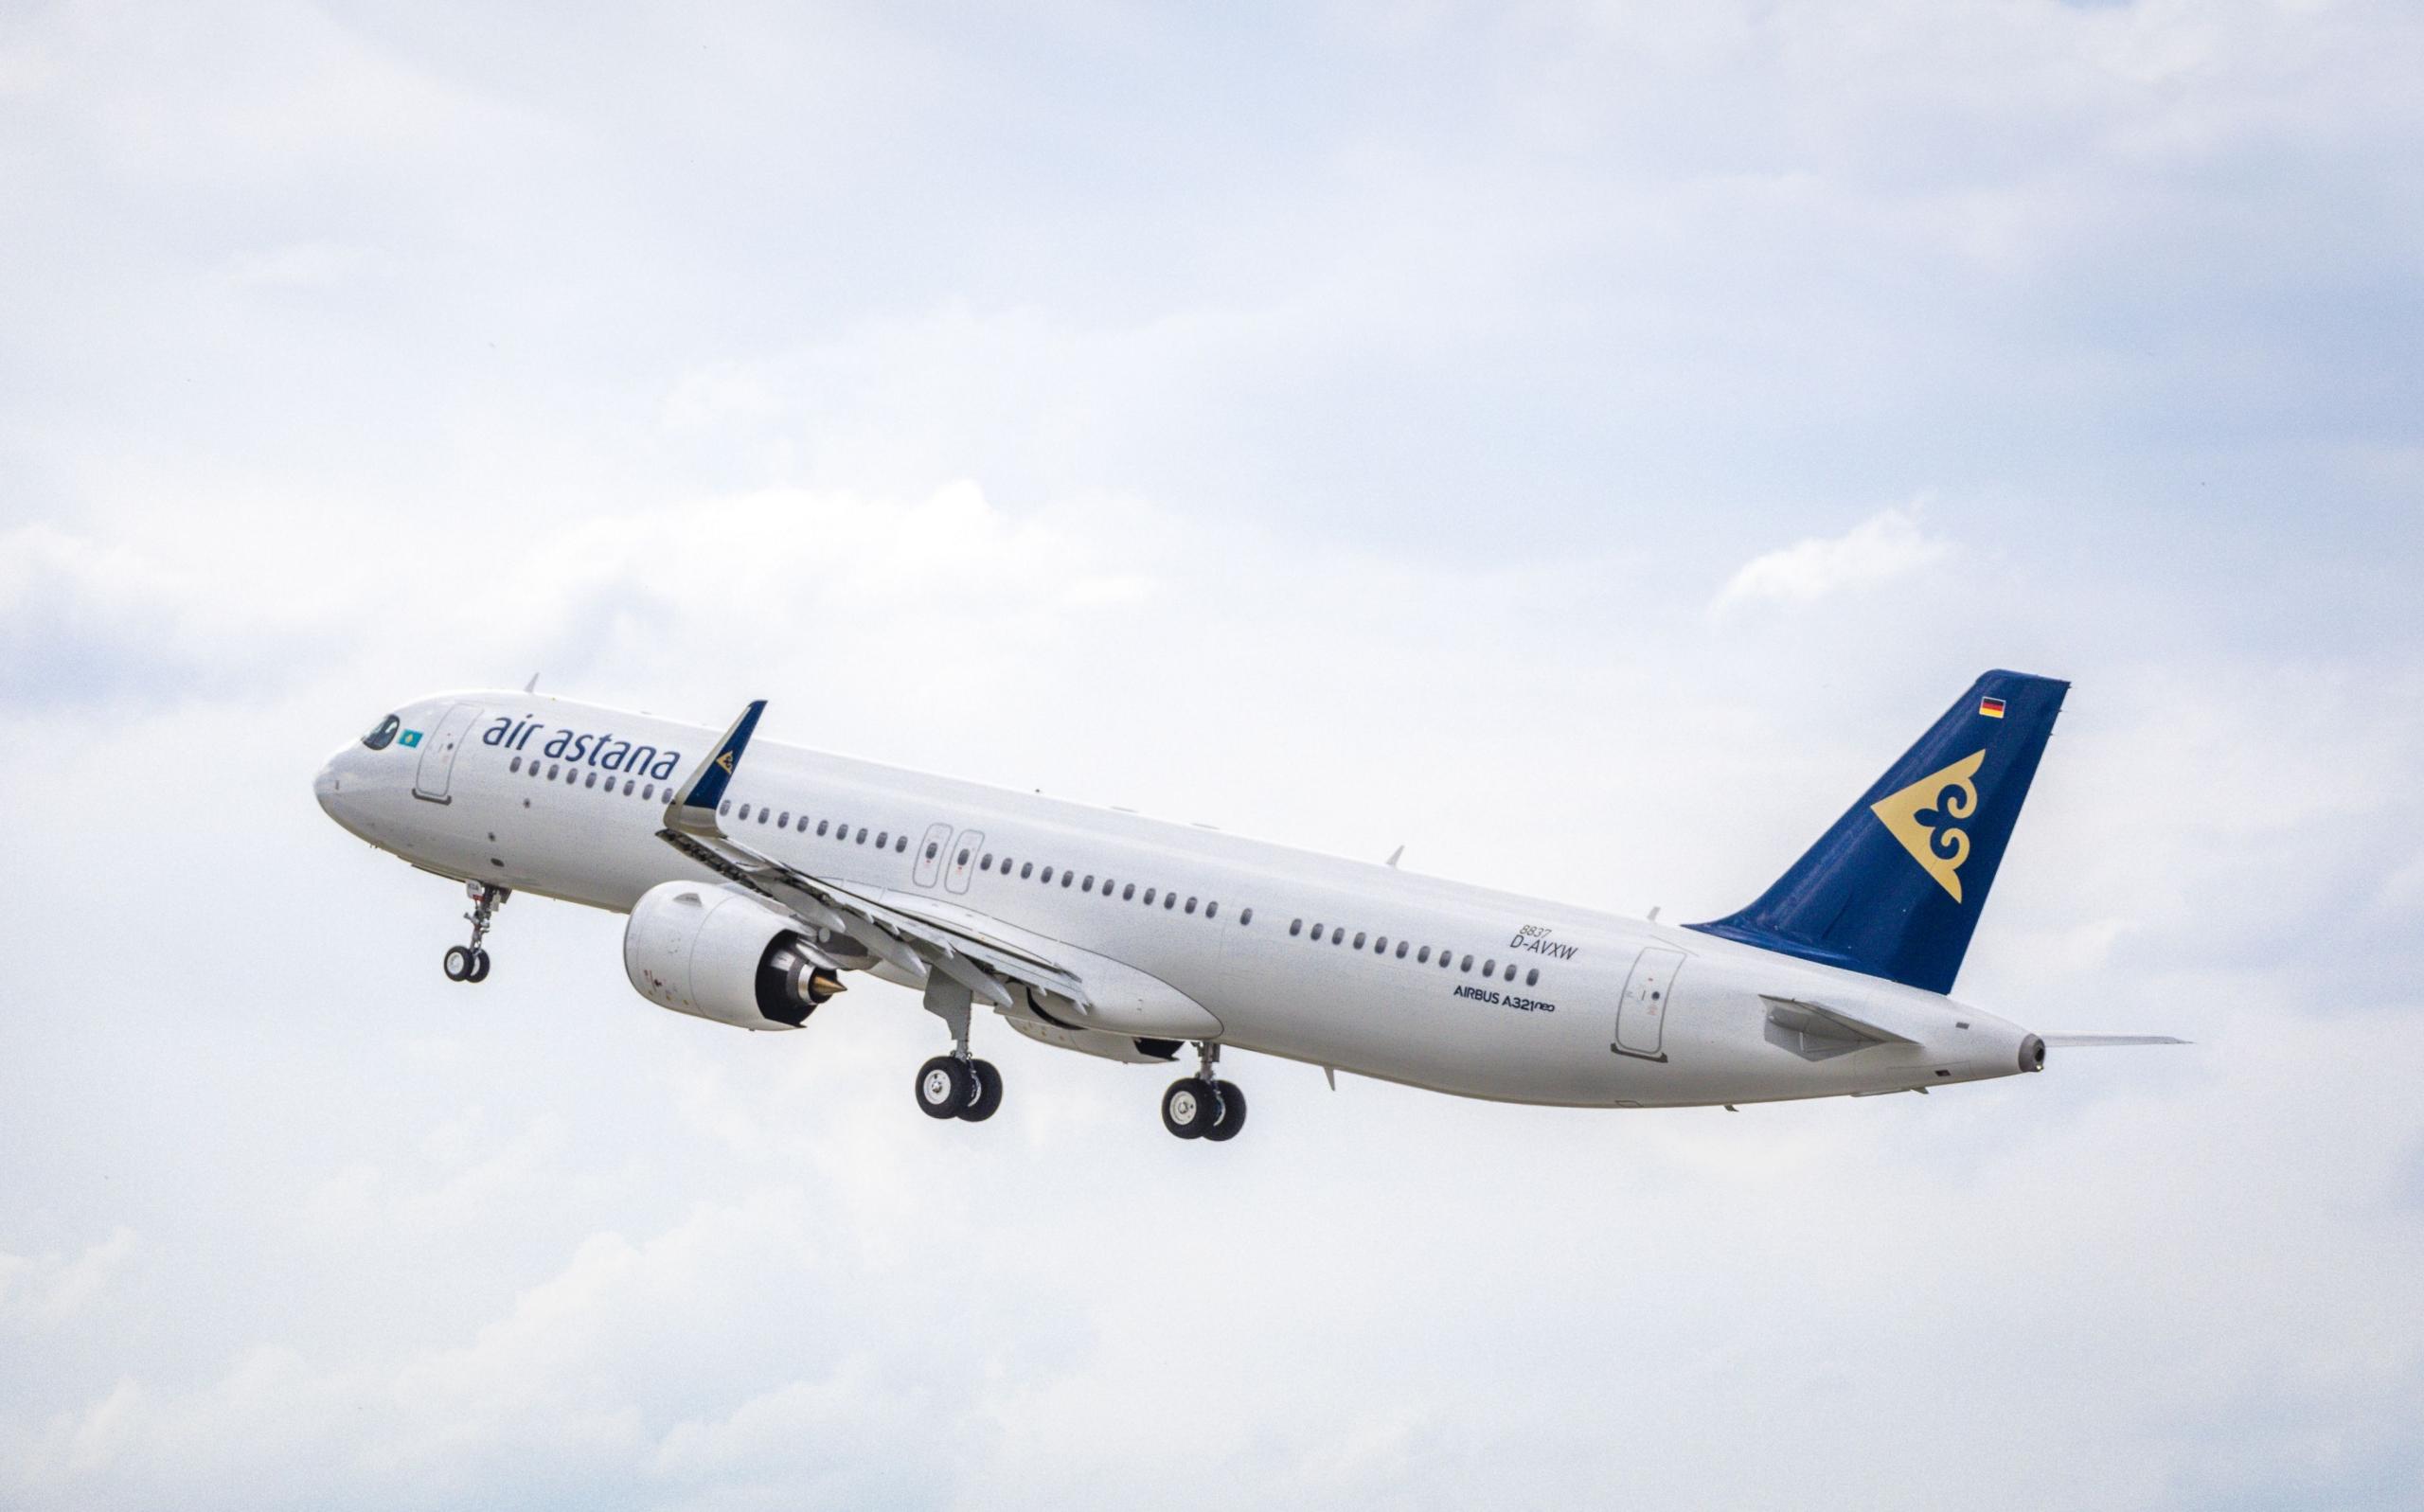 Air Astana, Airbus A321LR, London Heathrow